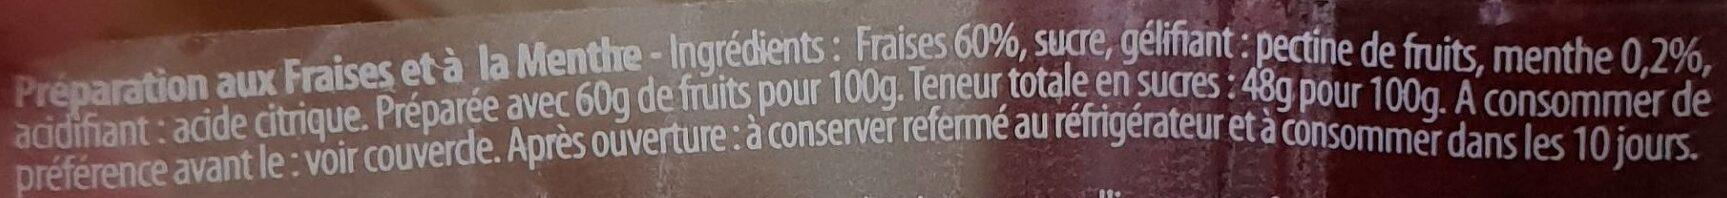 Confiture Fraise Menthe - Ingrediënten - fr